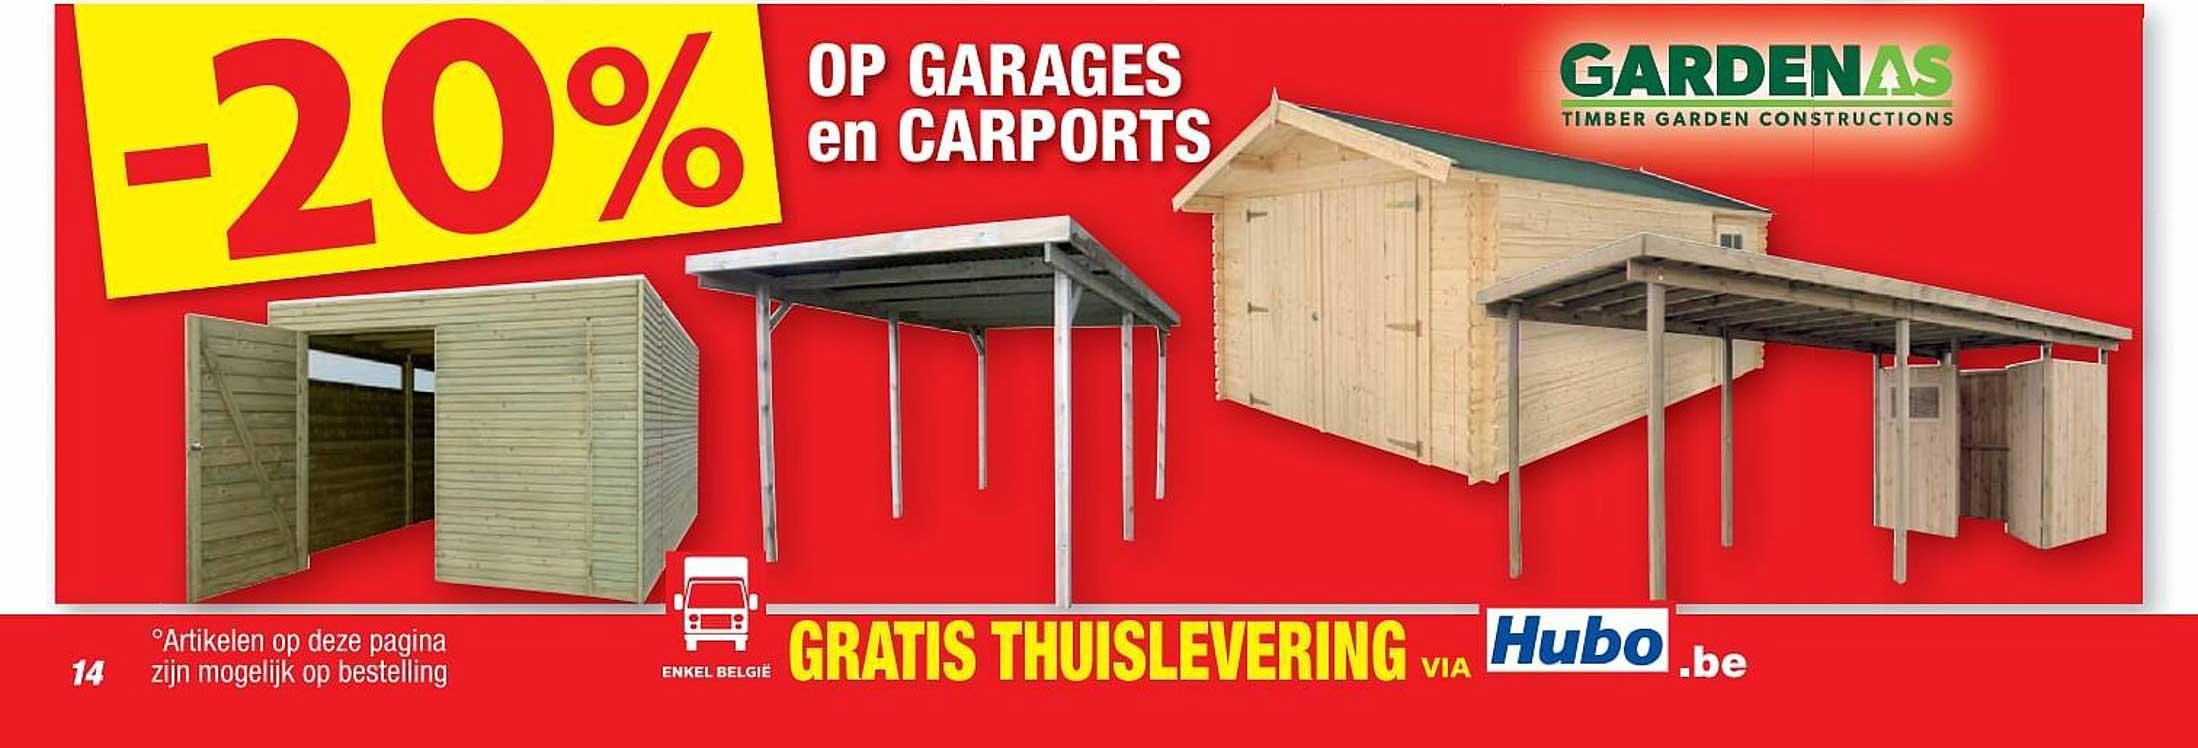 Hubo -20% Op Garages En Carports Gardenas